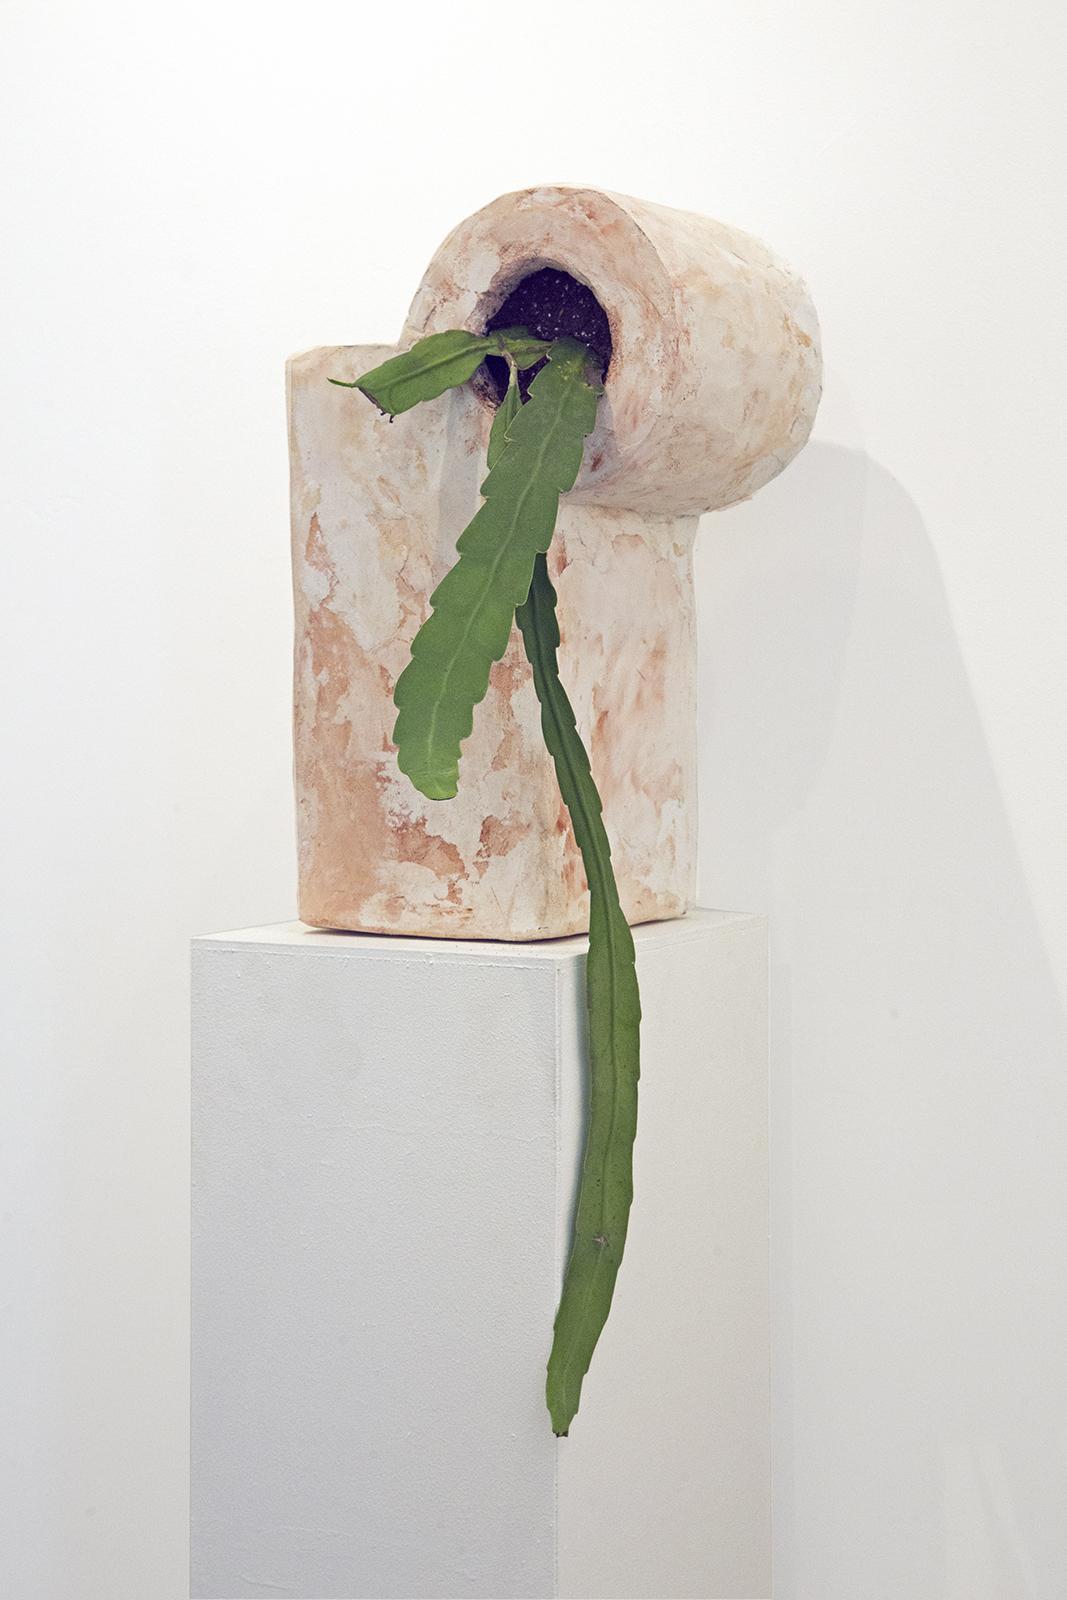 Trent Dean sculpture at Public Land Gallery